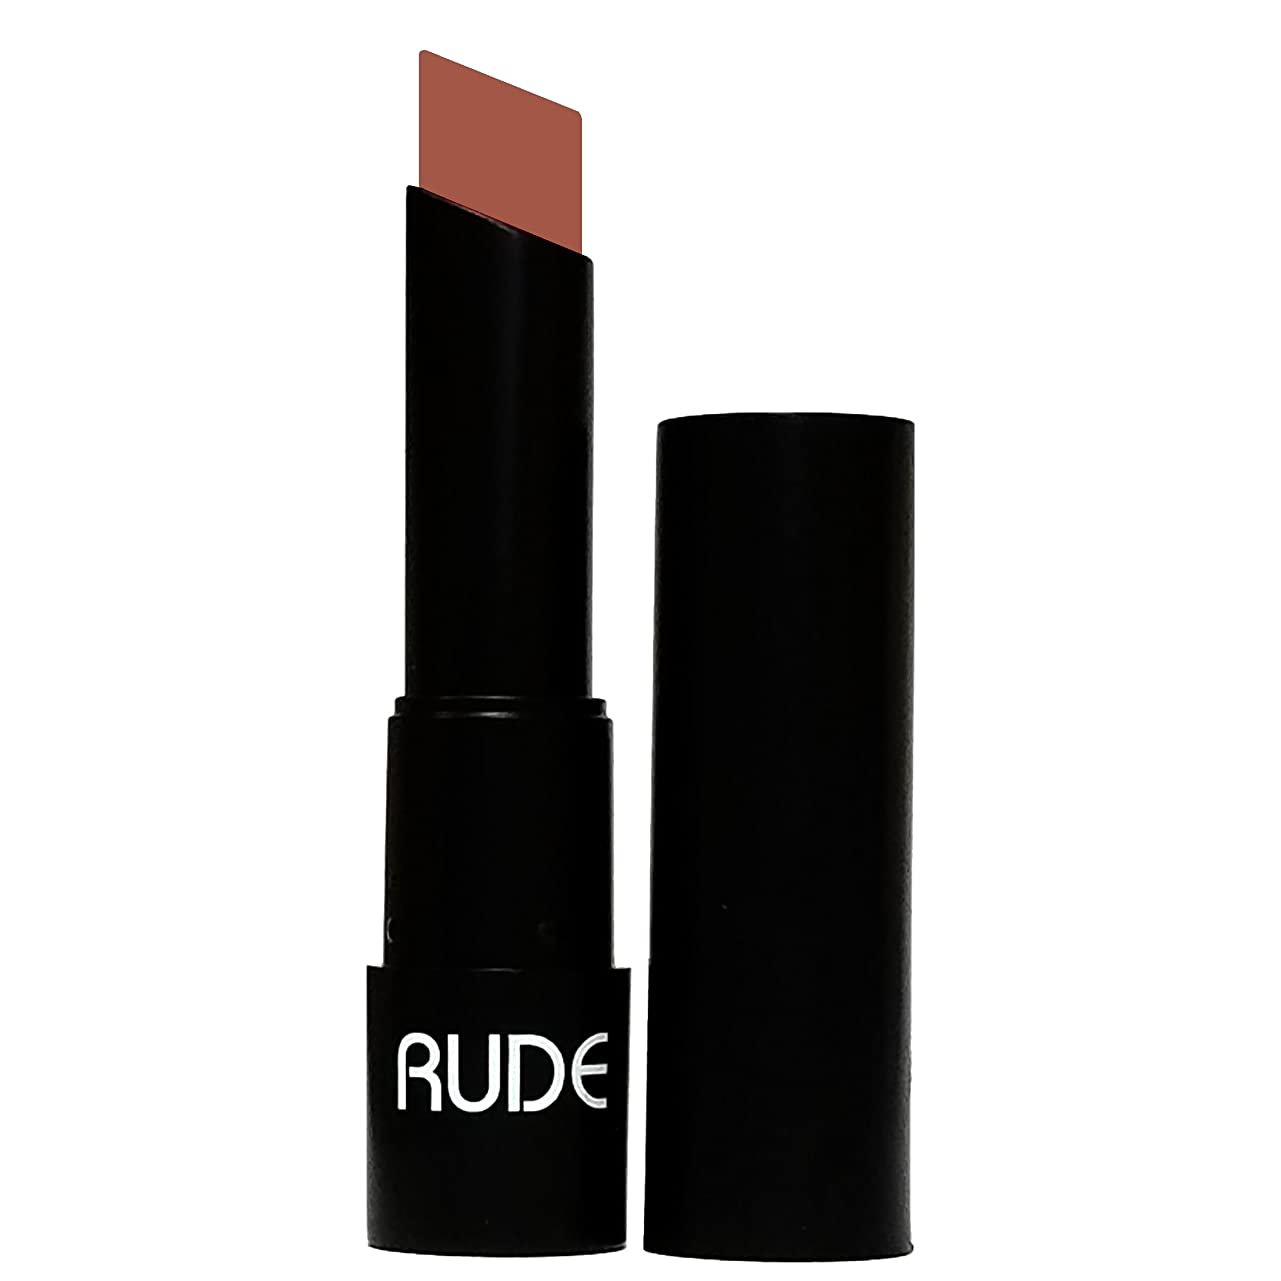 原始的な退却牽引(6 Pack) RUDE Attitude Matte Lipstick - Rebellious (並行輸入品)